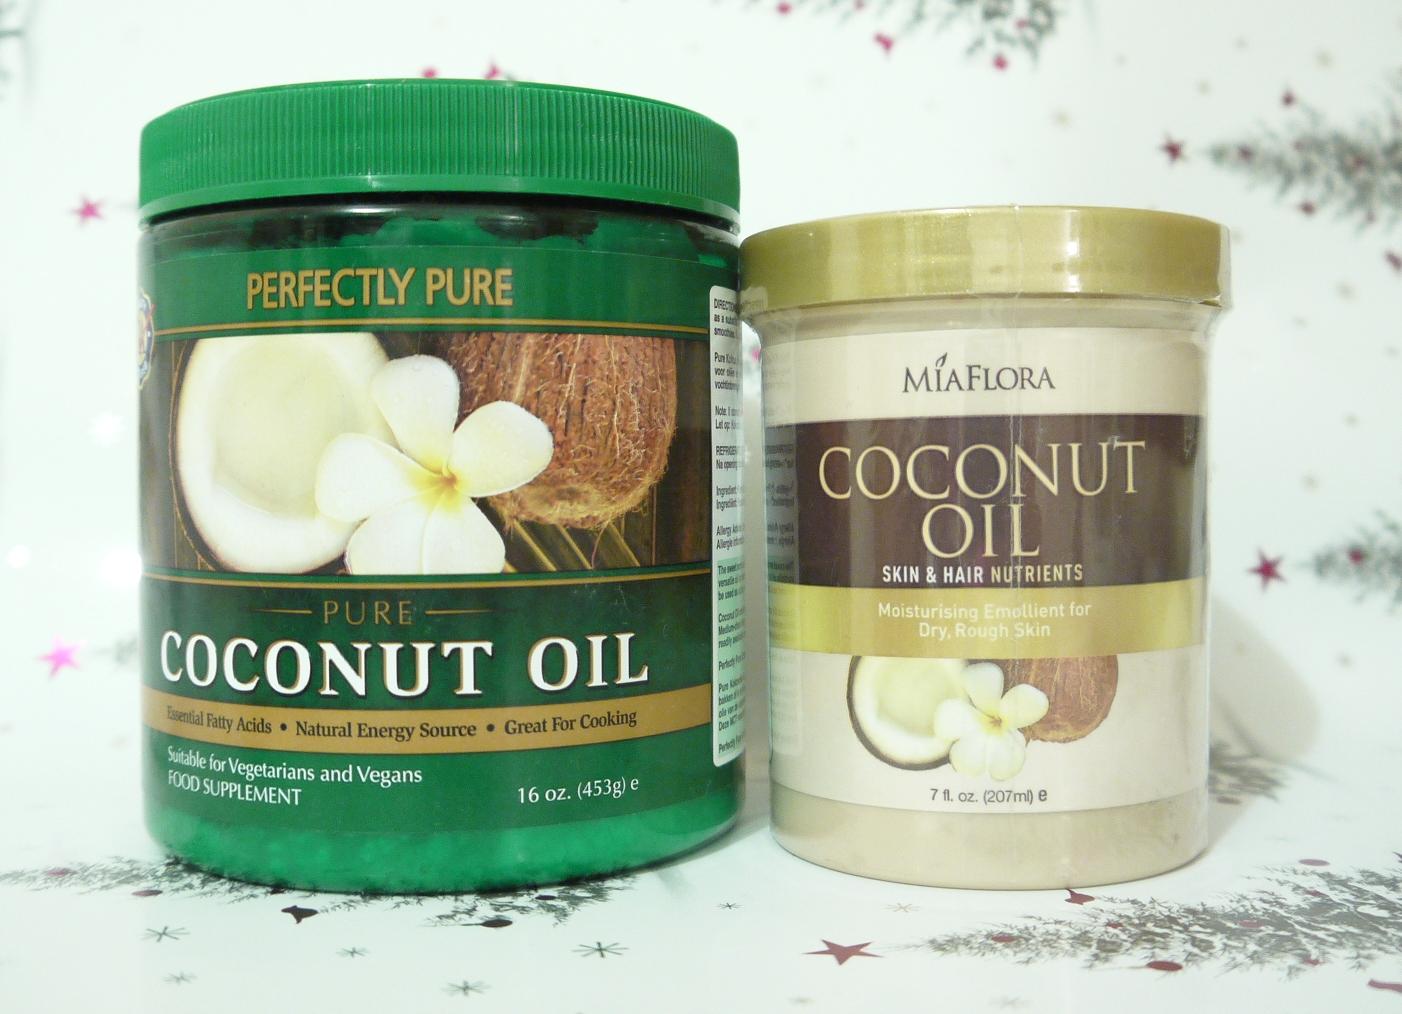 http://3.bp.blogspot.com/-adr3wR1o-cQ/ULiUupg-kMI/AAAAAAAADEA/1bC3sIunPvY/s1600/coconut+oil.JPG